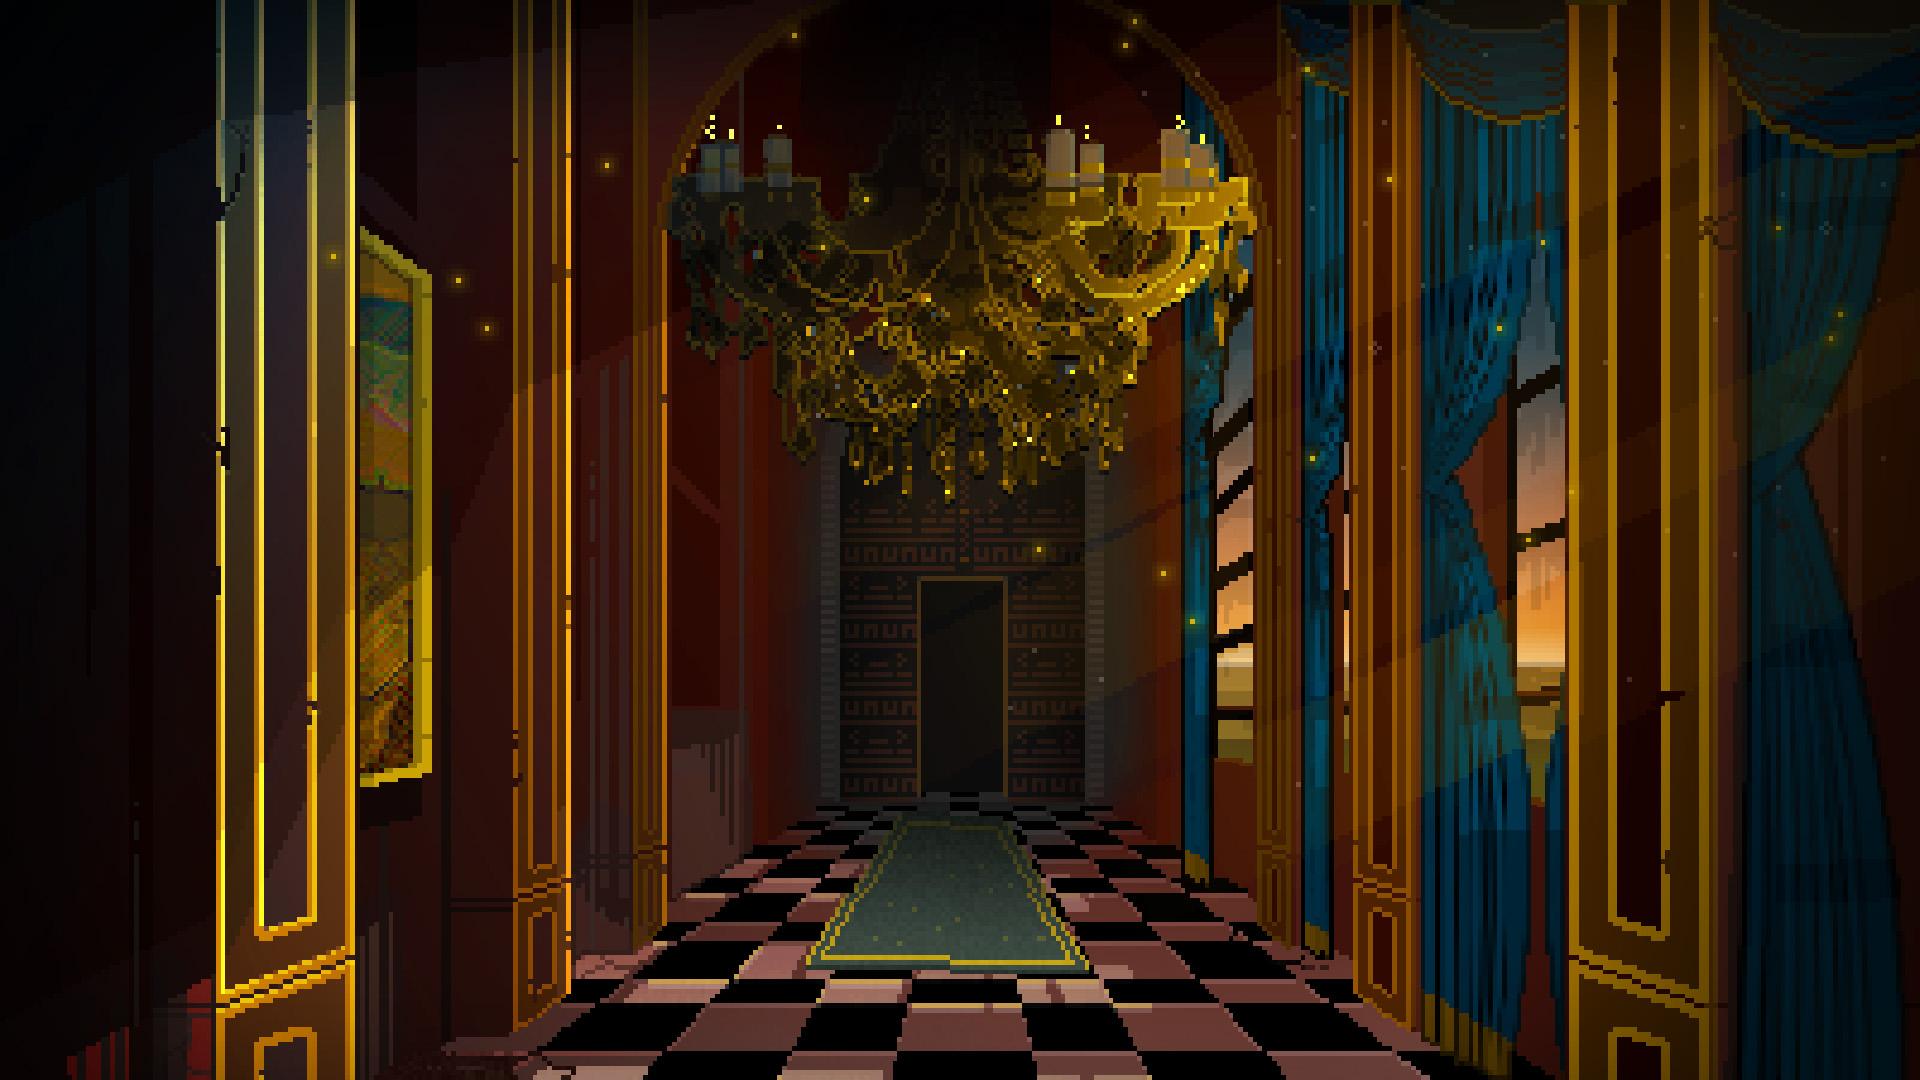 Pixel chambers Wallpaper from Hammerwatch gamepressurecom 1920x1080